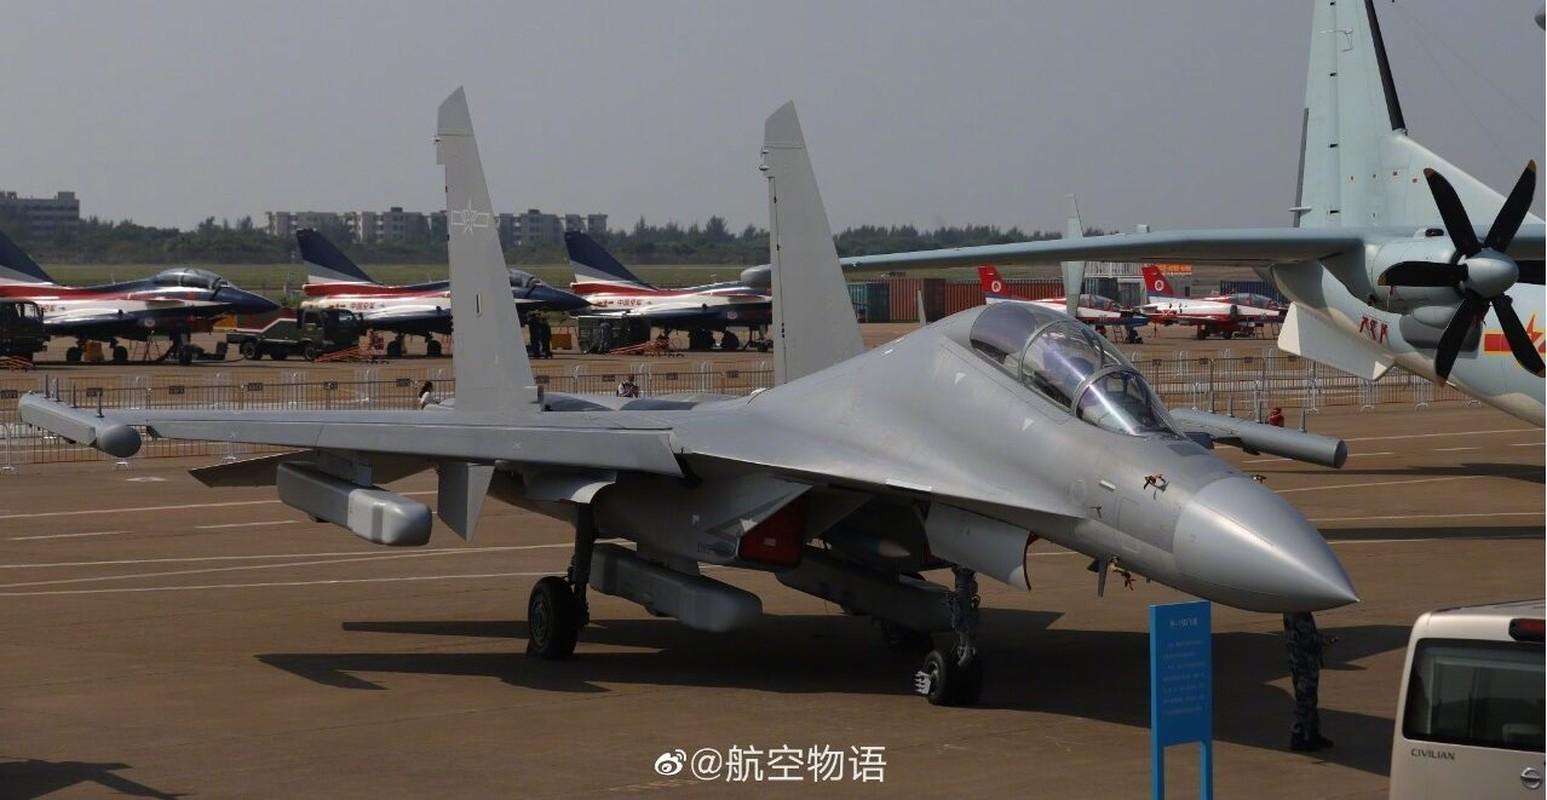 May bay tac chien dien tu J-16D Trung Quoc co de doa duoc My?-Hinh-8